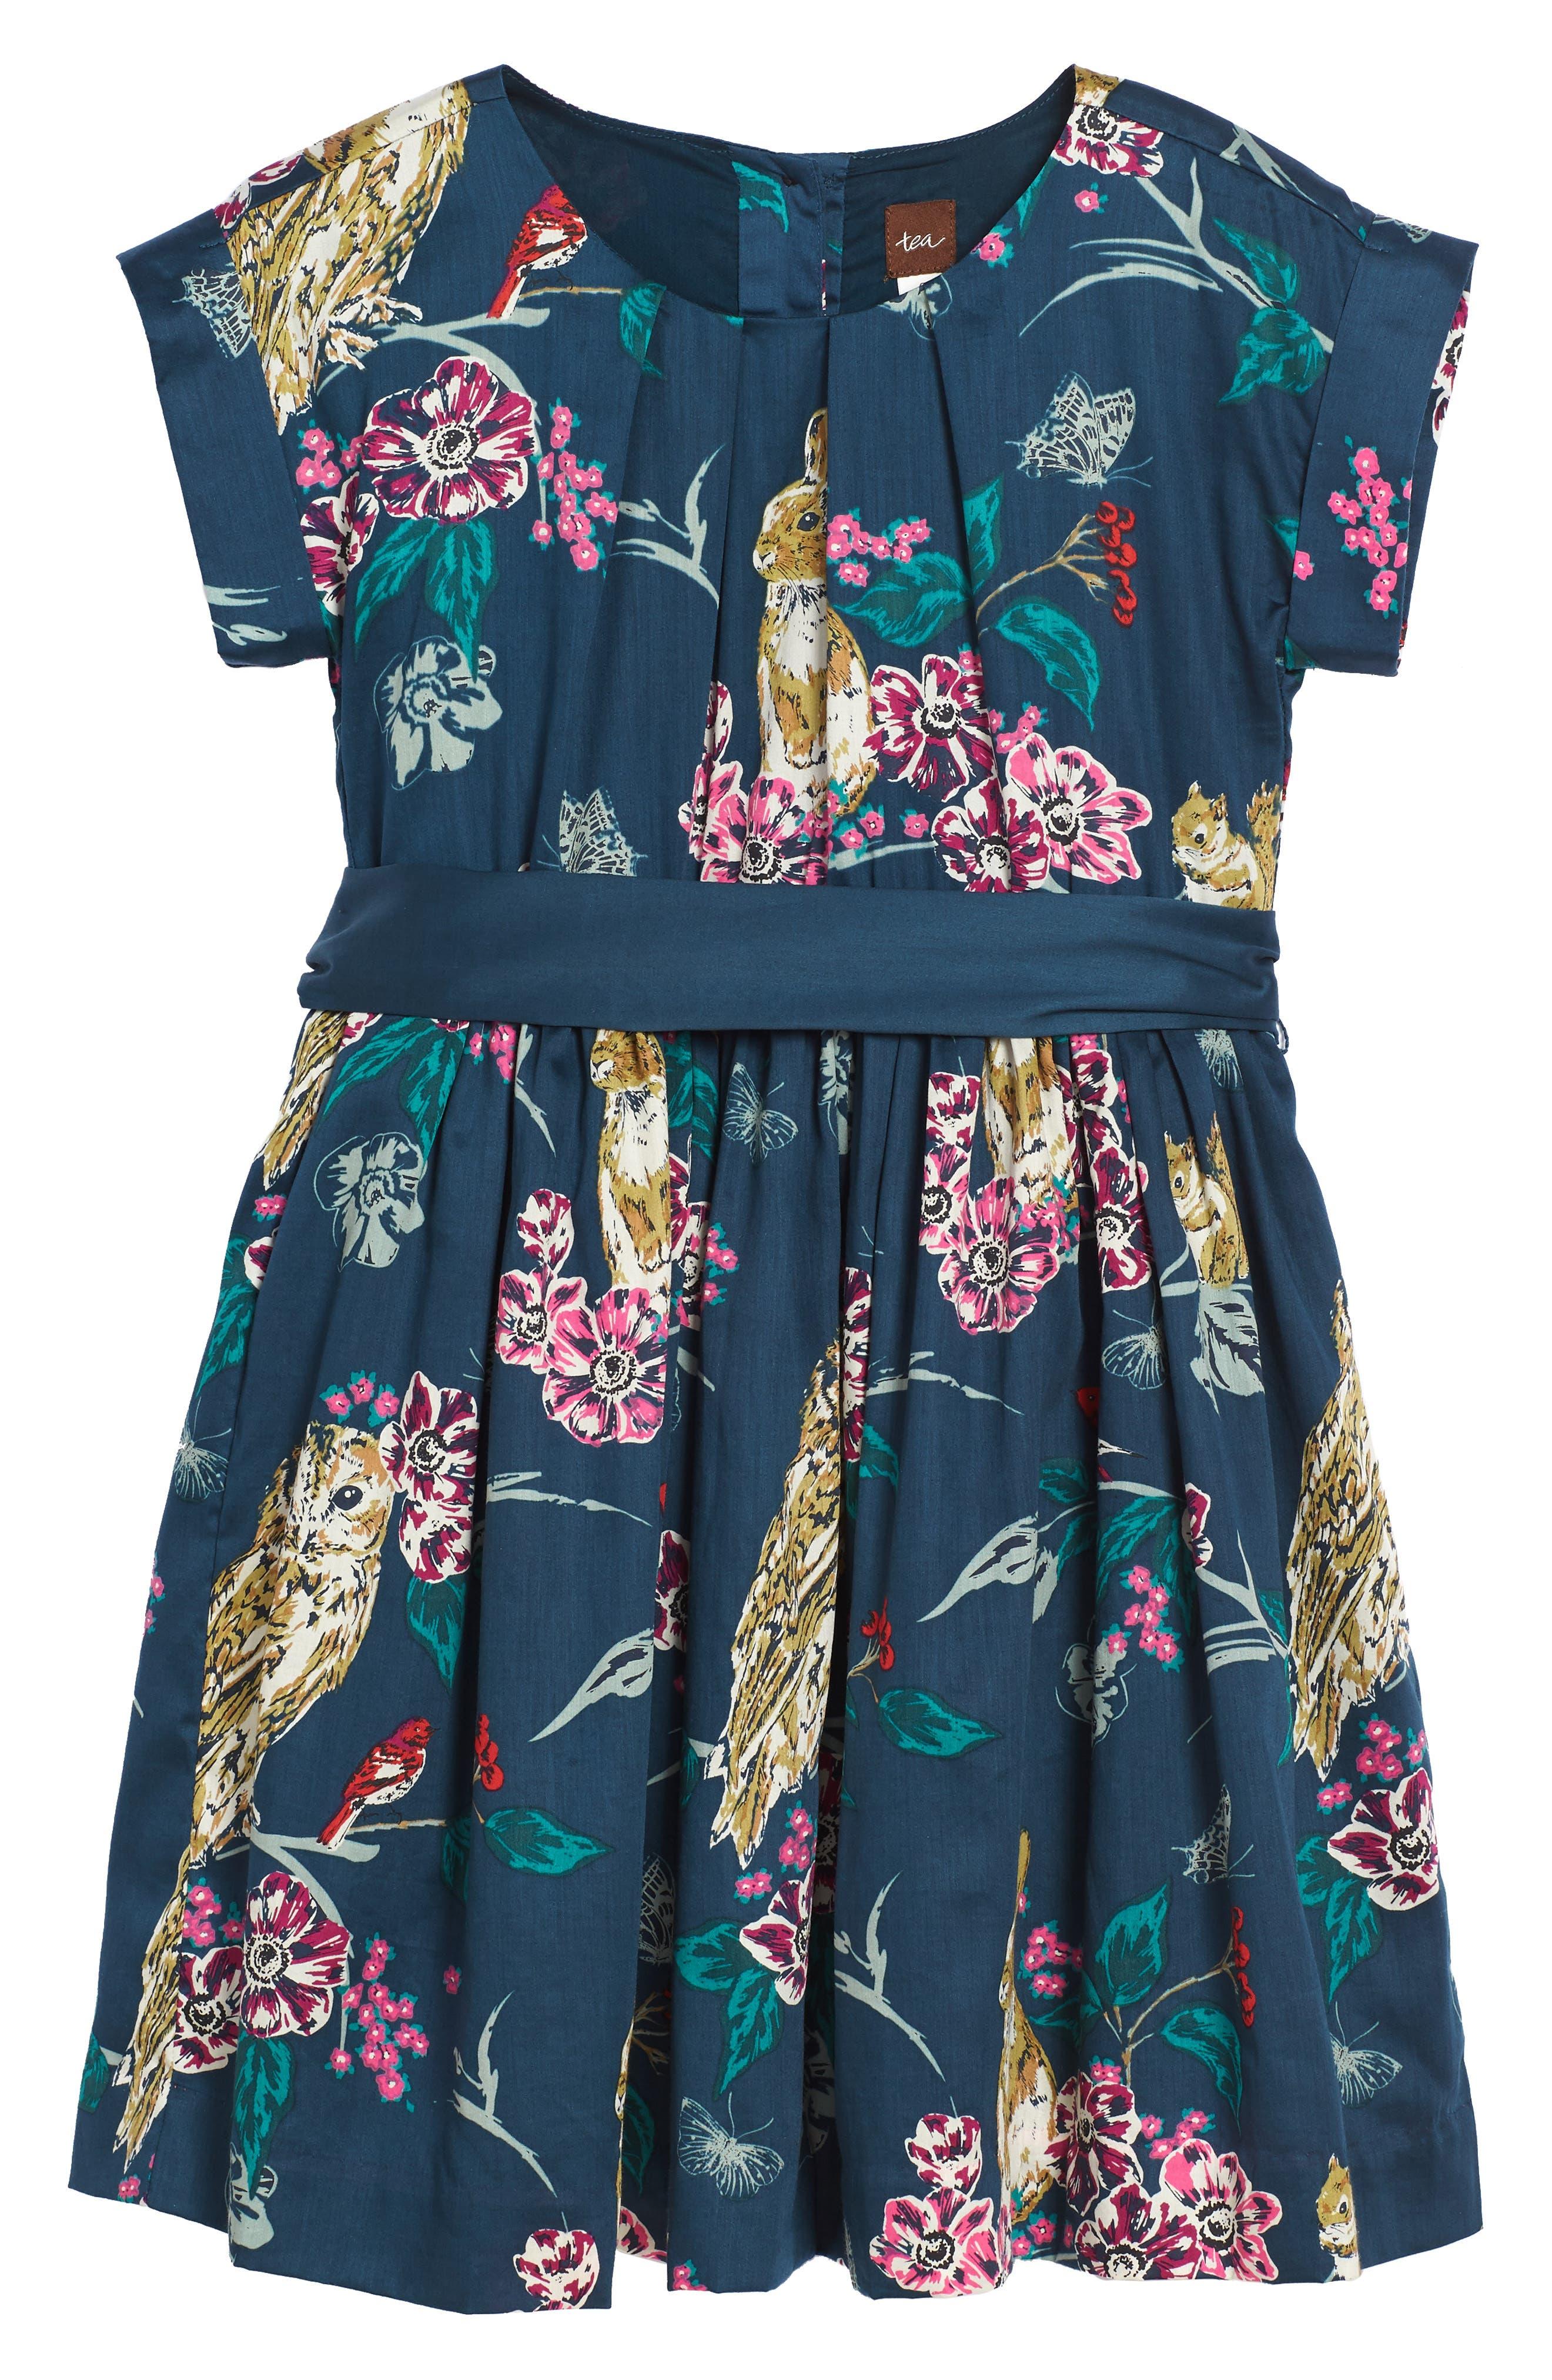 Main Image - Tea Collection Caledonian Forest Sash Dress (Toddler Girls, Little Girls & Big Girls)